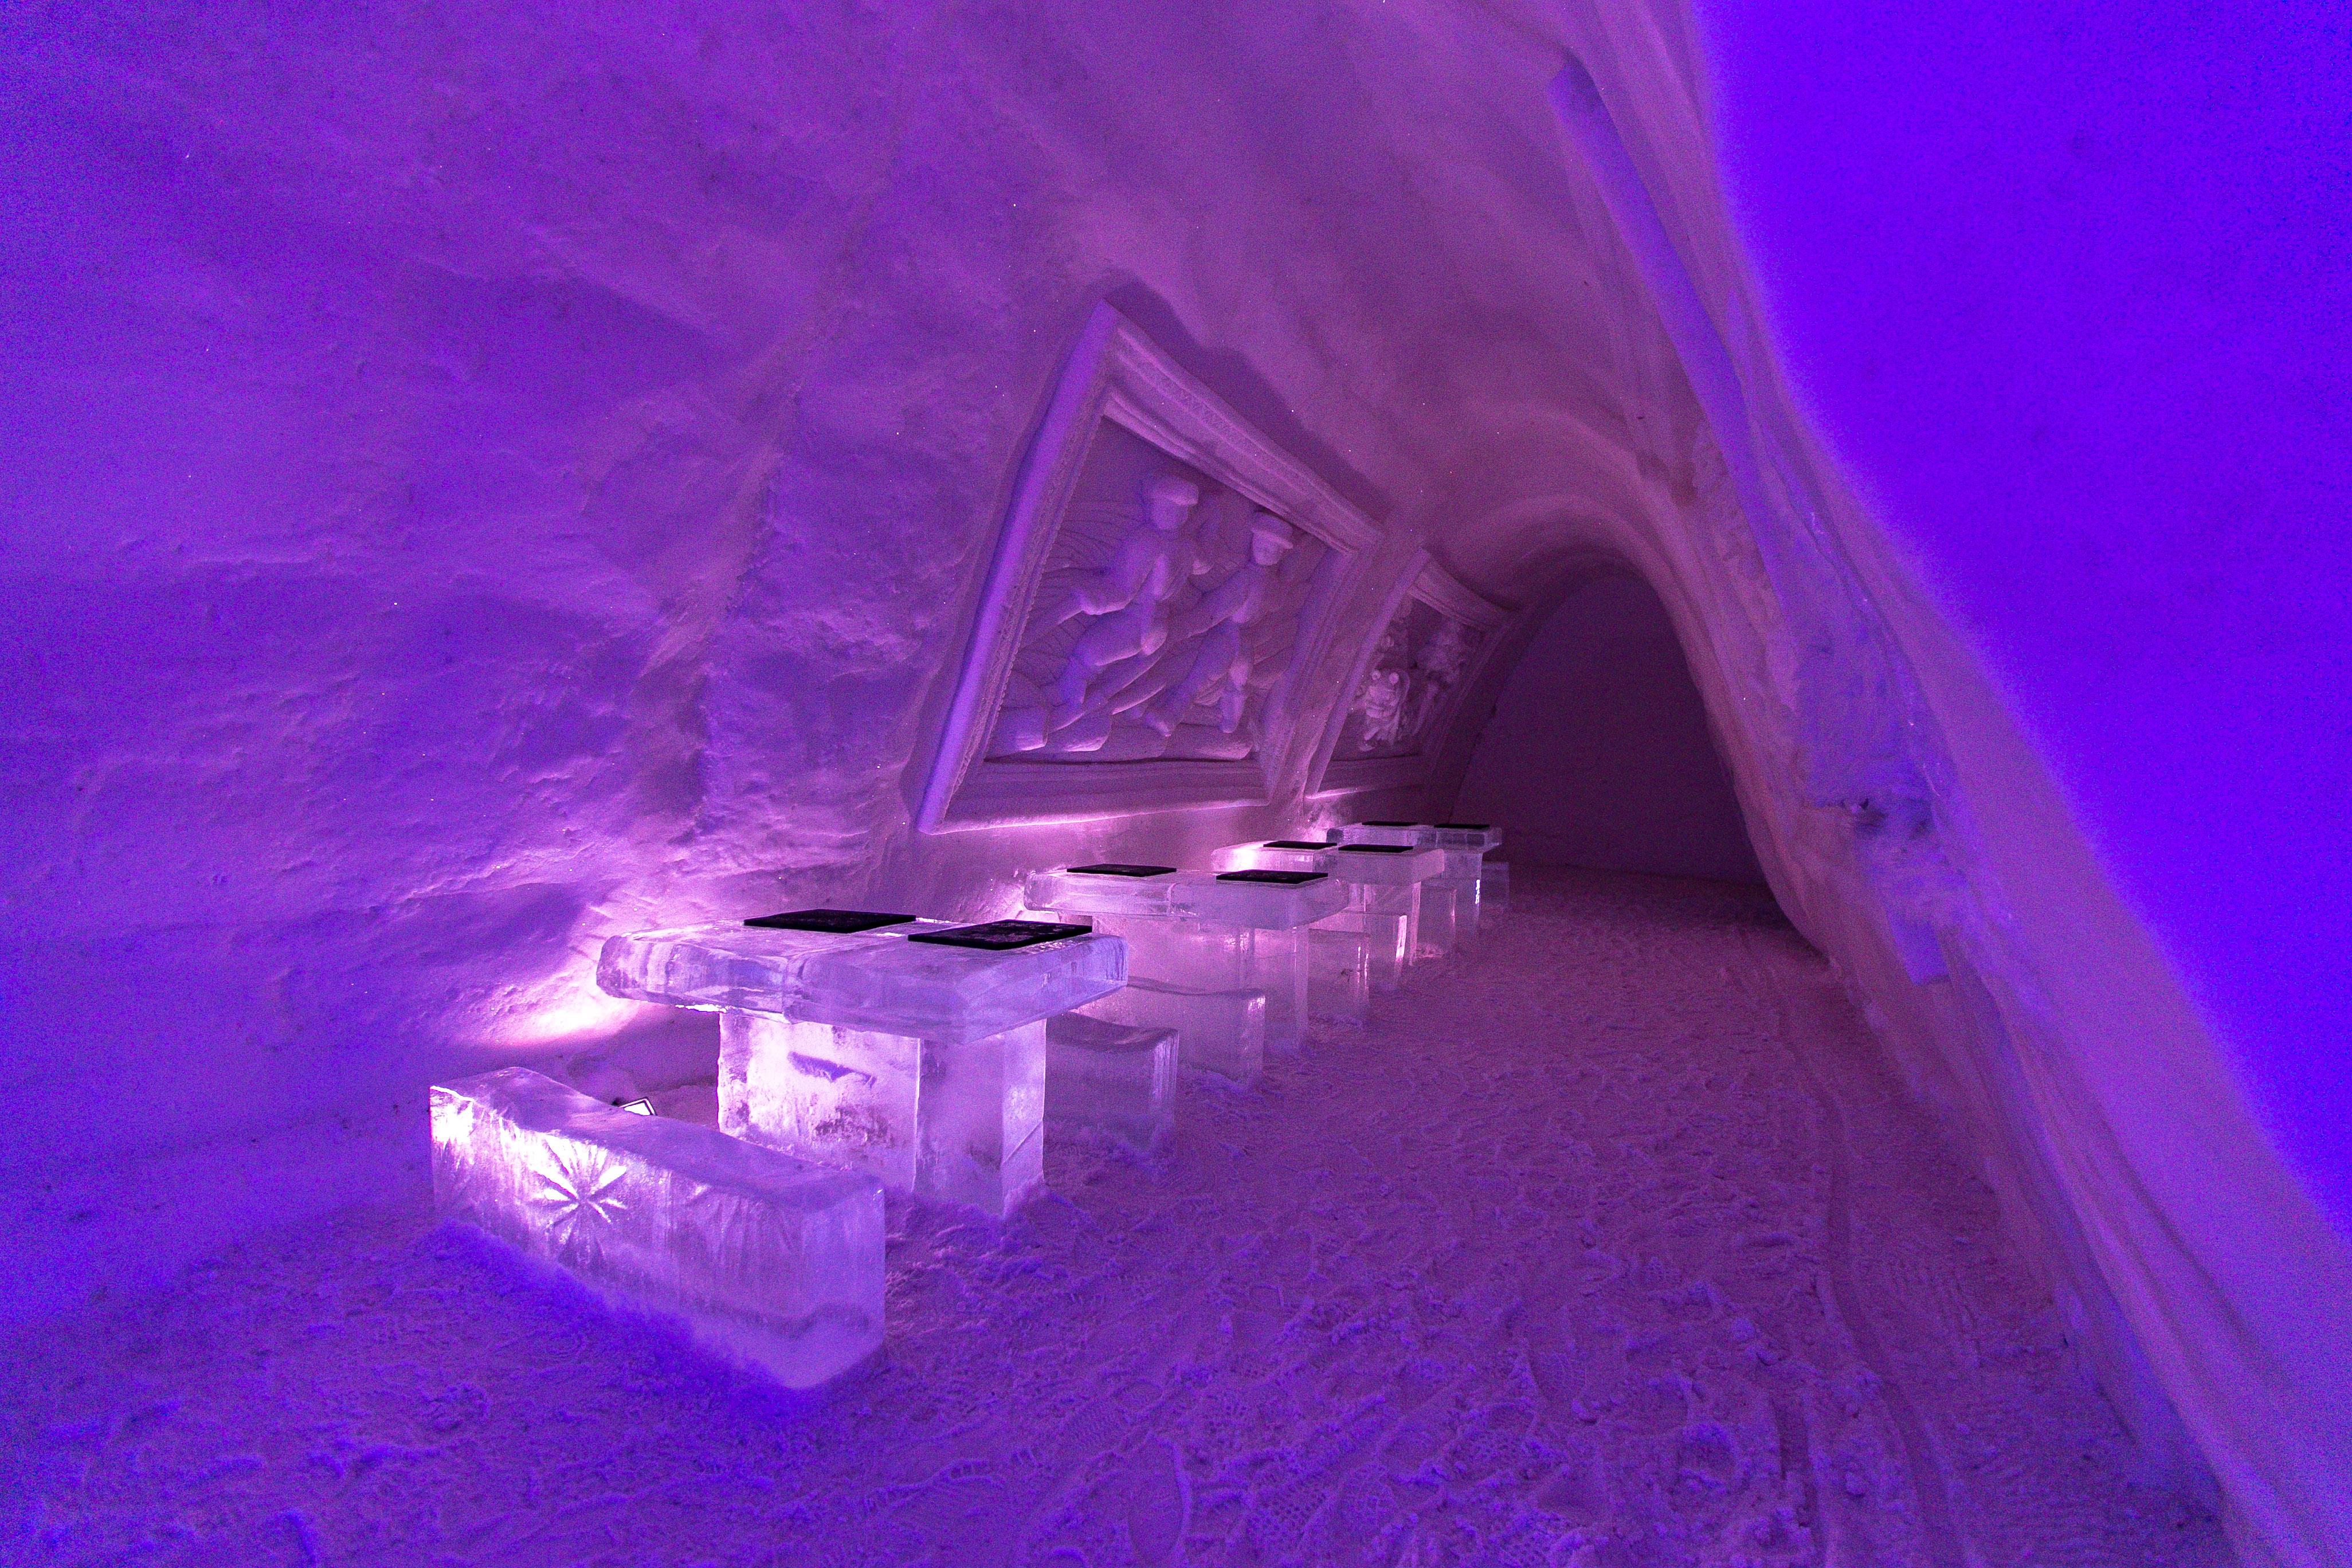 Snowvillage Finnland